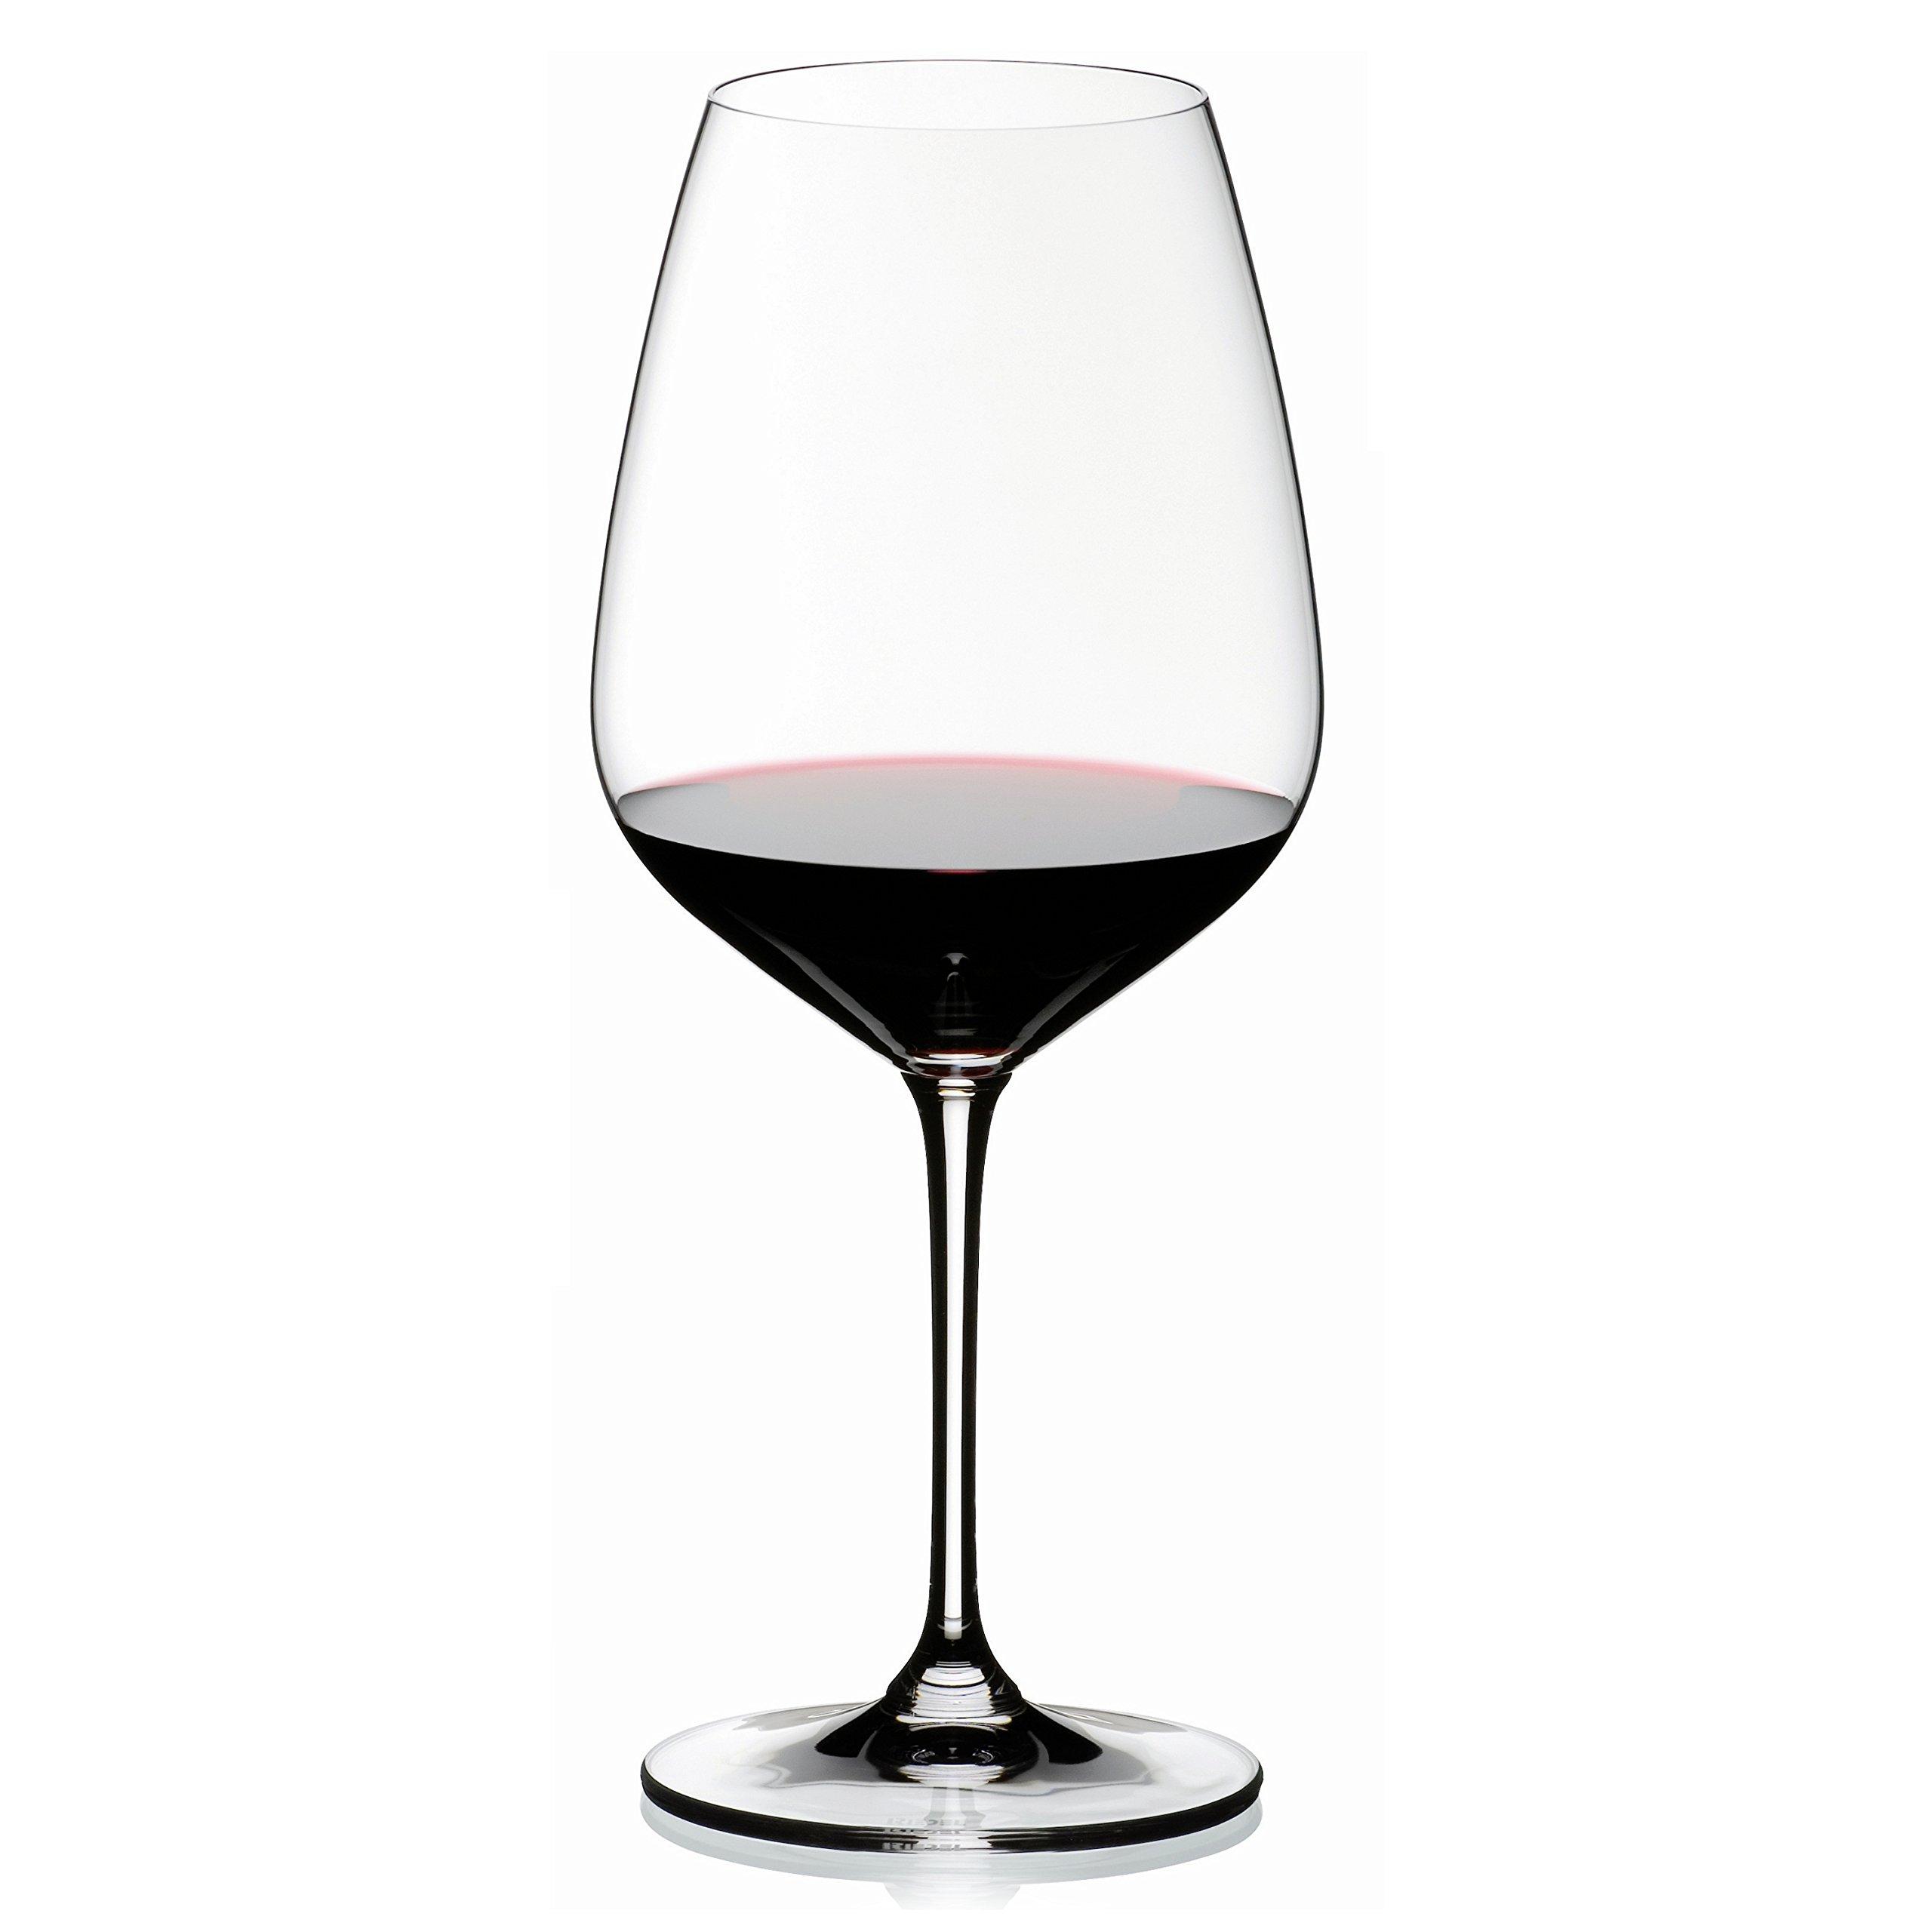 Riedel Vinum Extreme Leaded Crystal Cabernet/Merlot Wine Glass, Set of 6